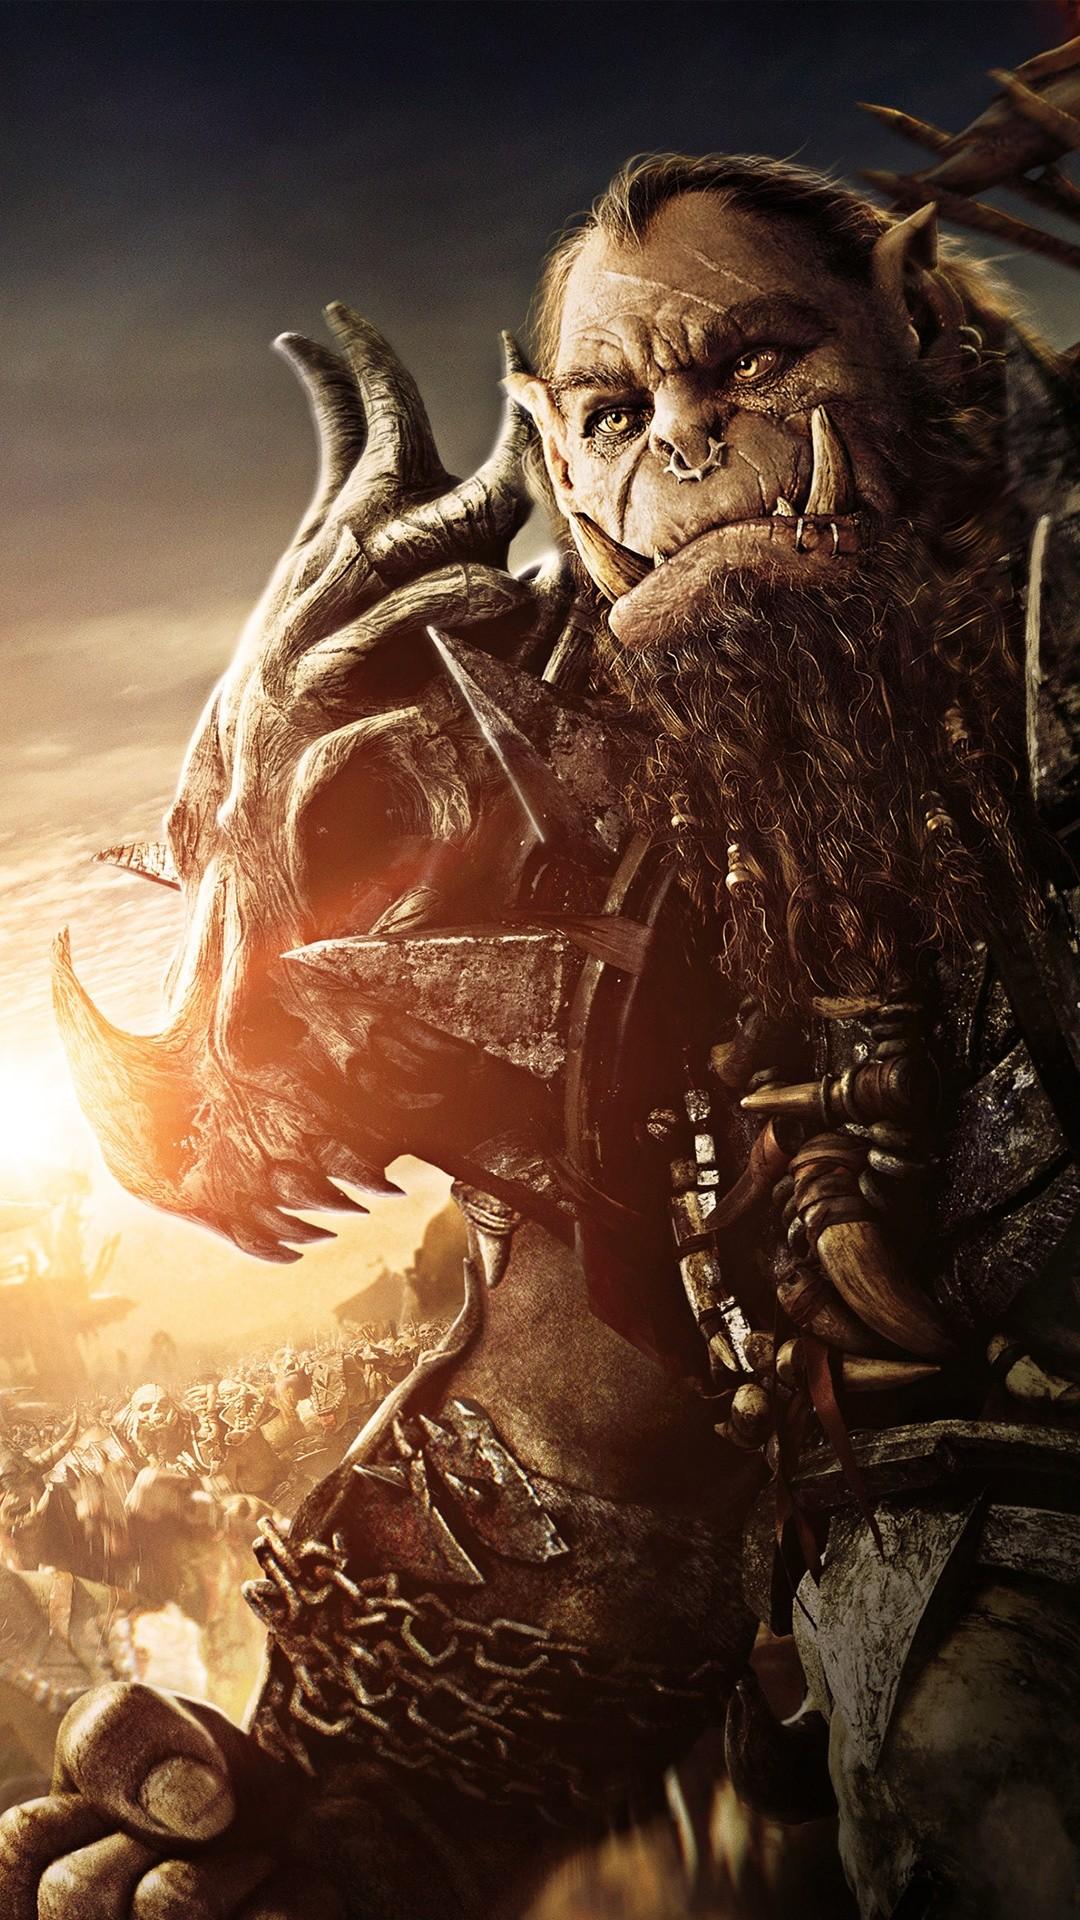 Free Blackhand Warcraft Movie phone wallpaper by savannawl